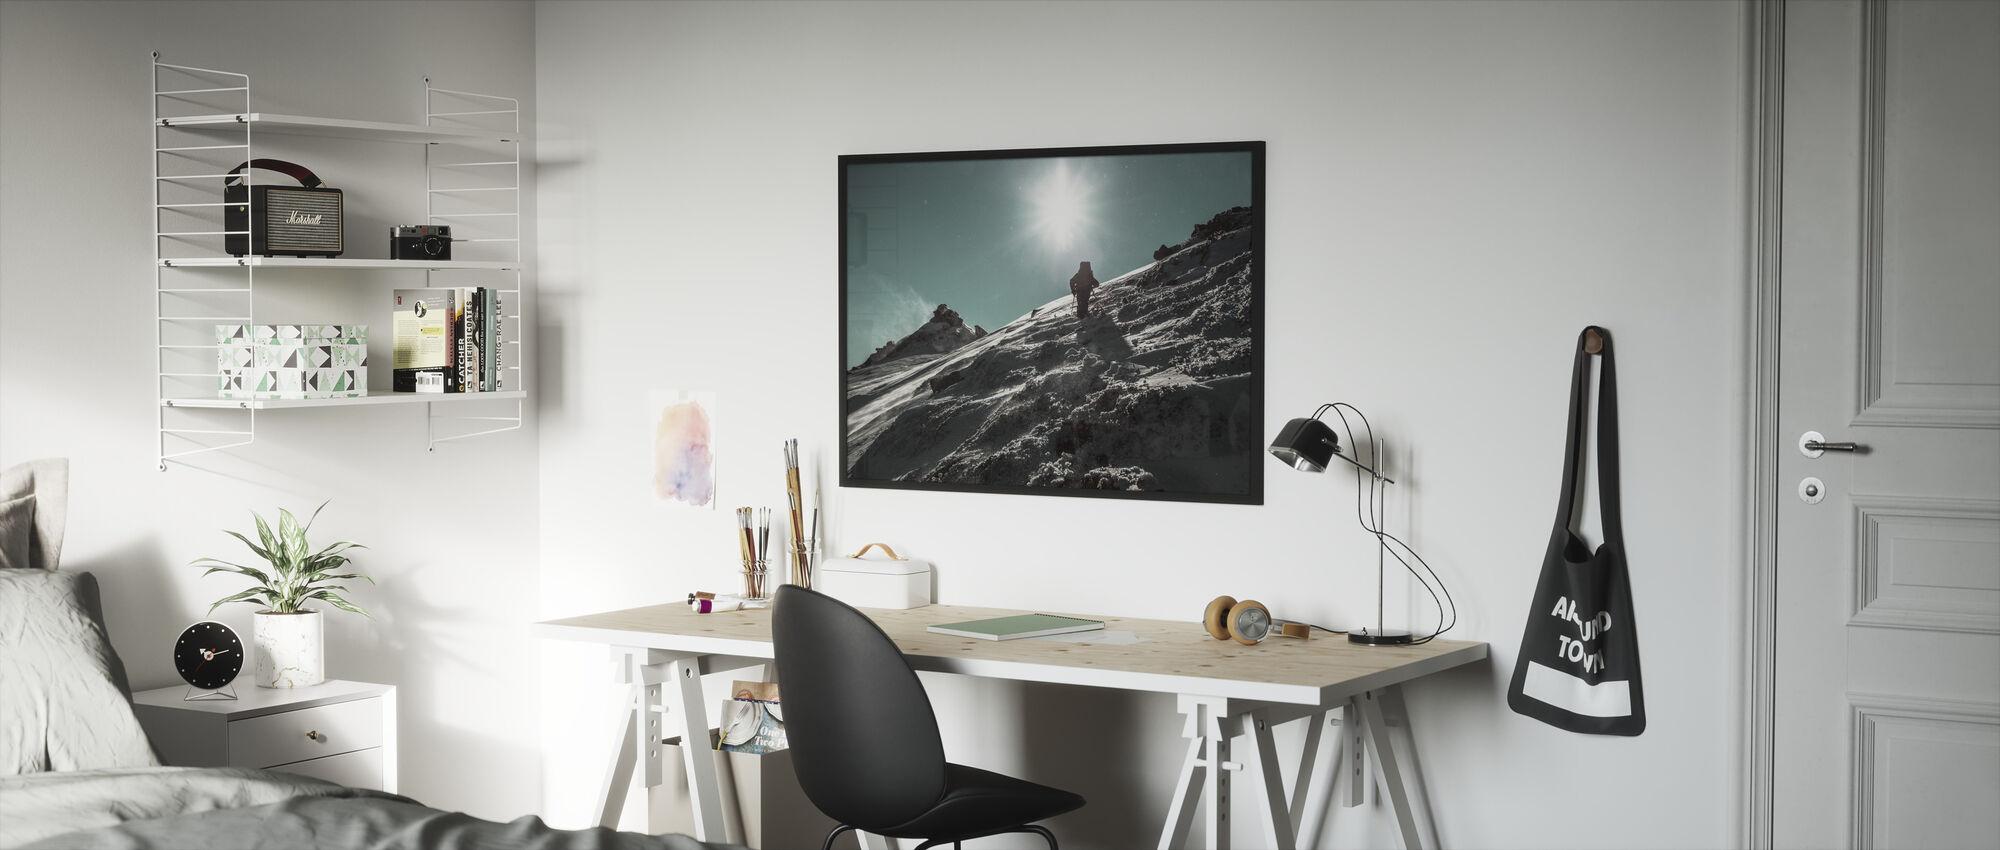 Winter Wandeling - Ingelijste print - Kinderkamer